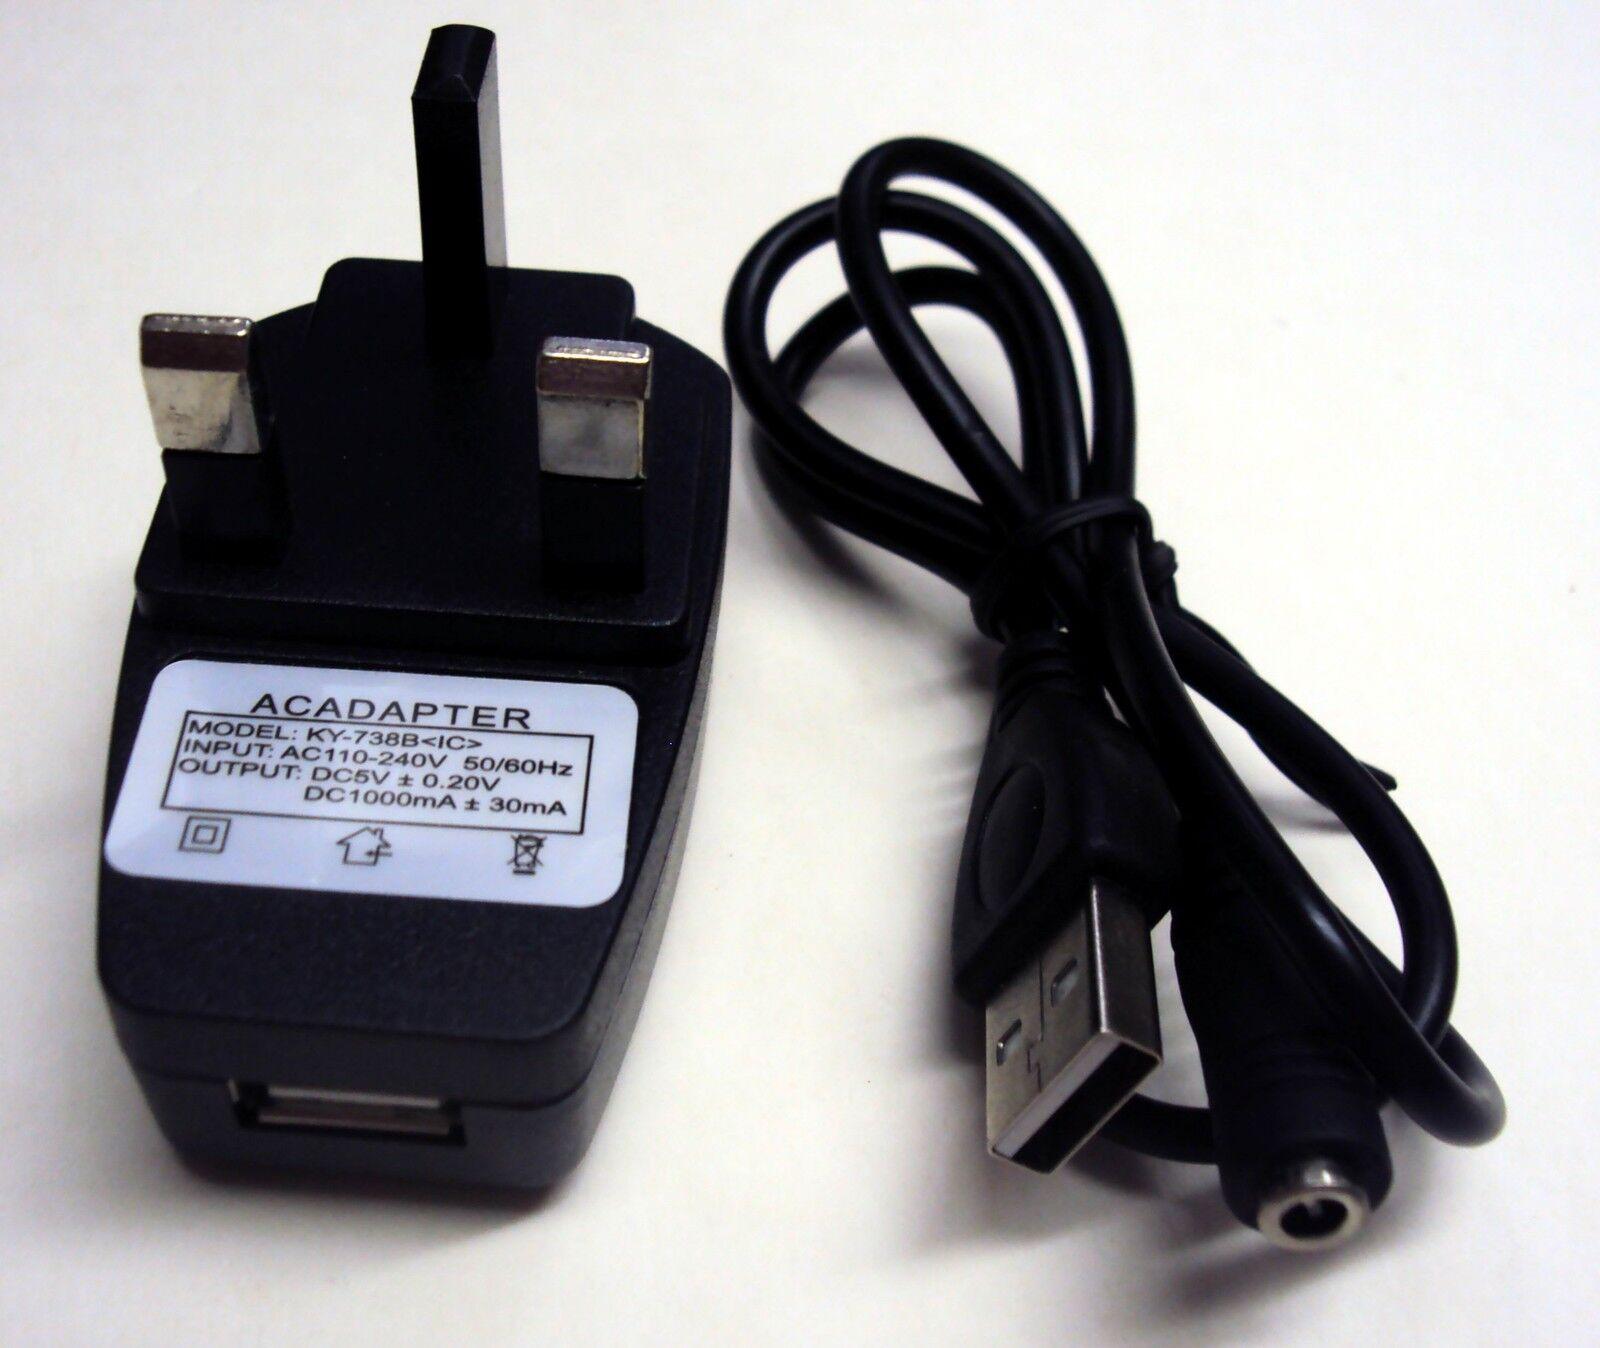 DC 3.5mm Female Jack to USB Socket Power Plug Connector Cable + UK Wall Plug